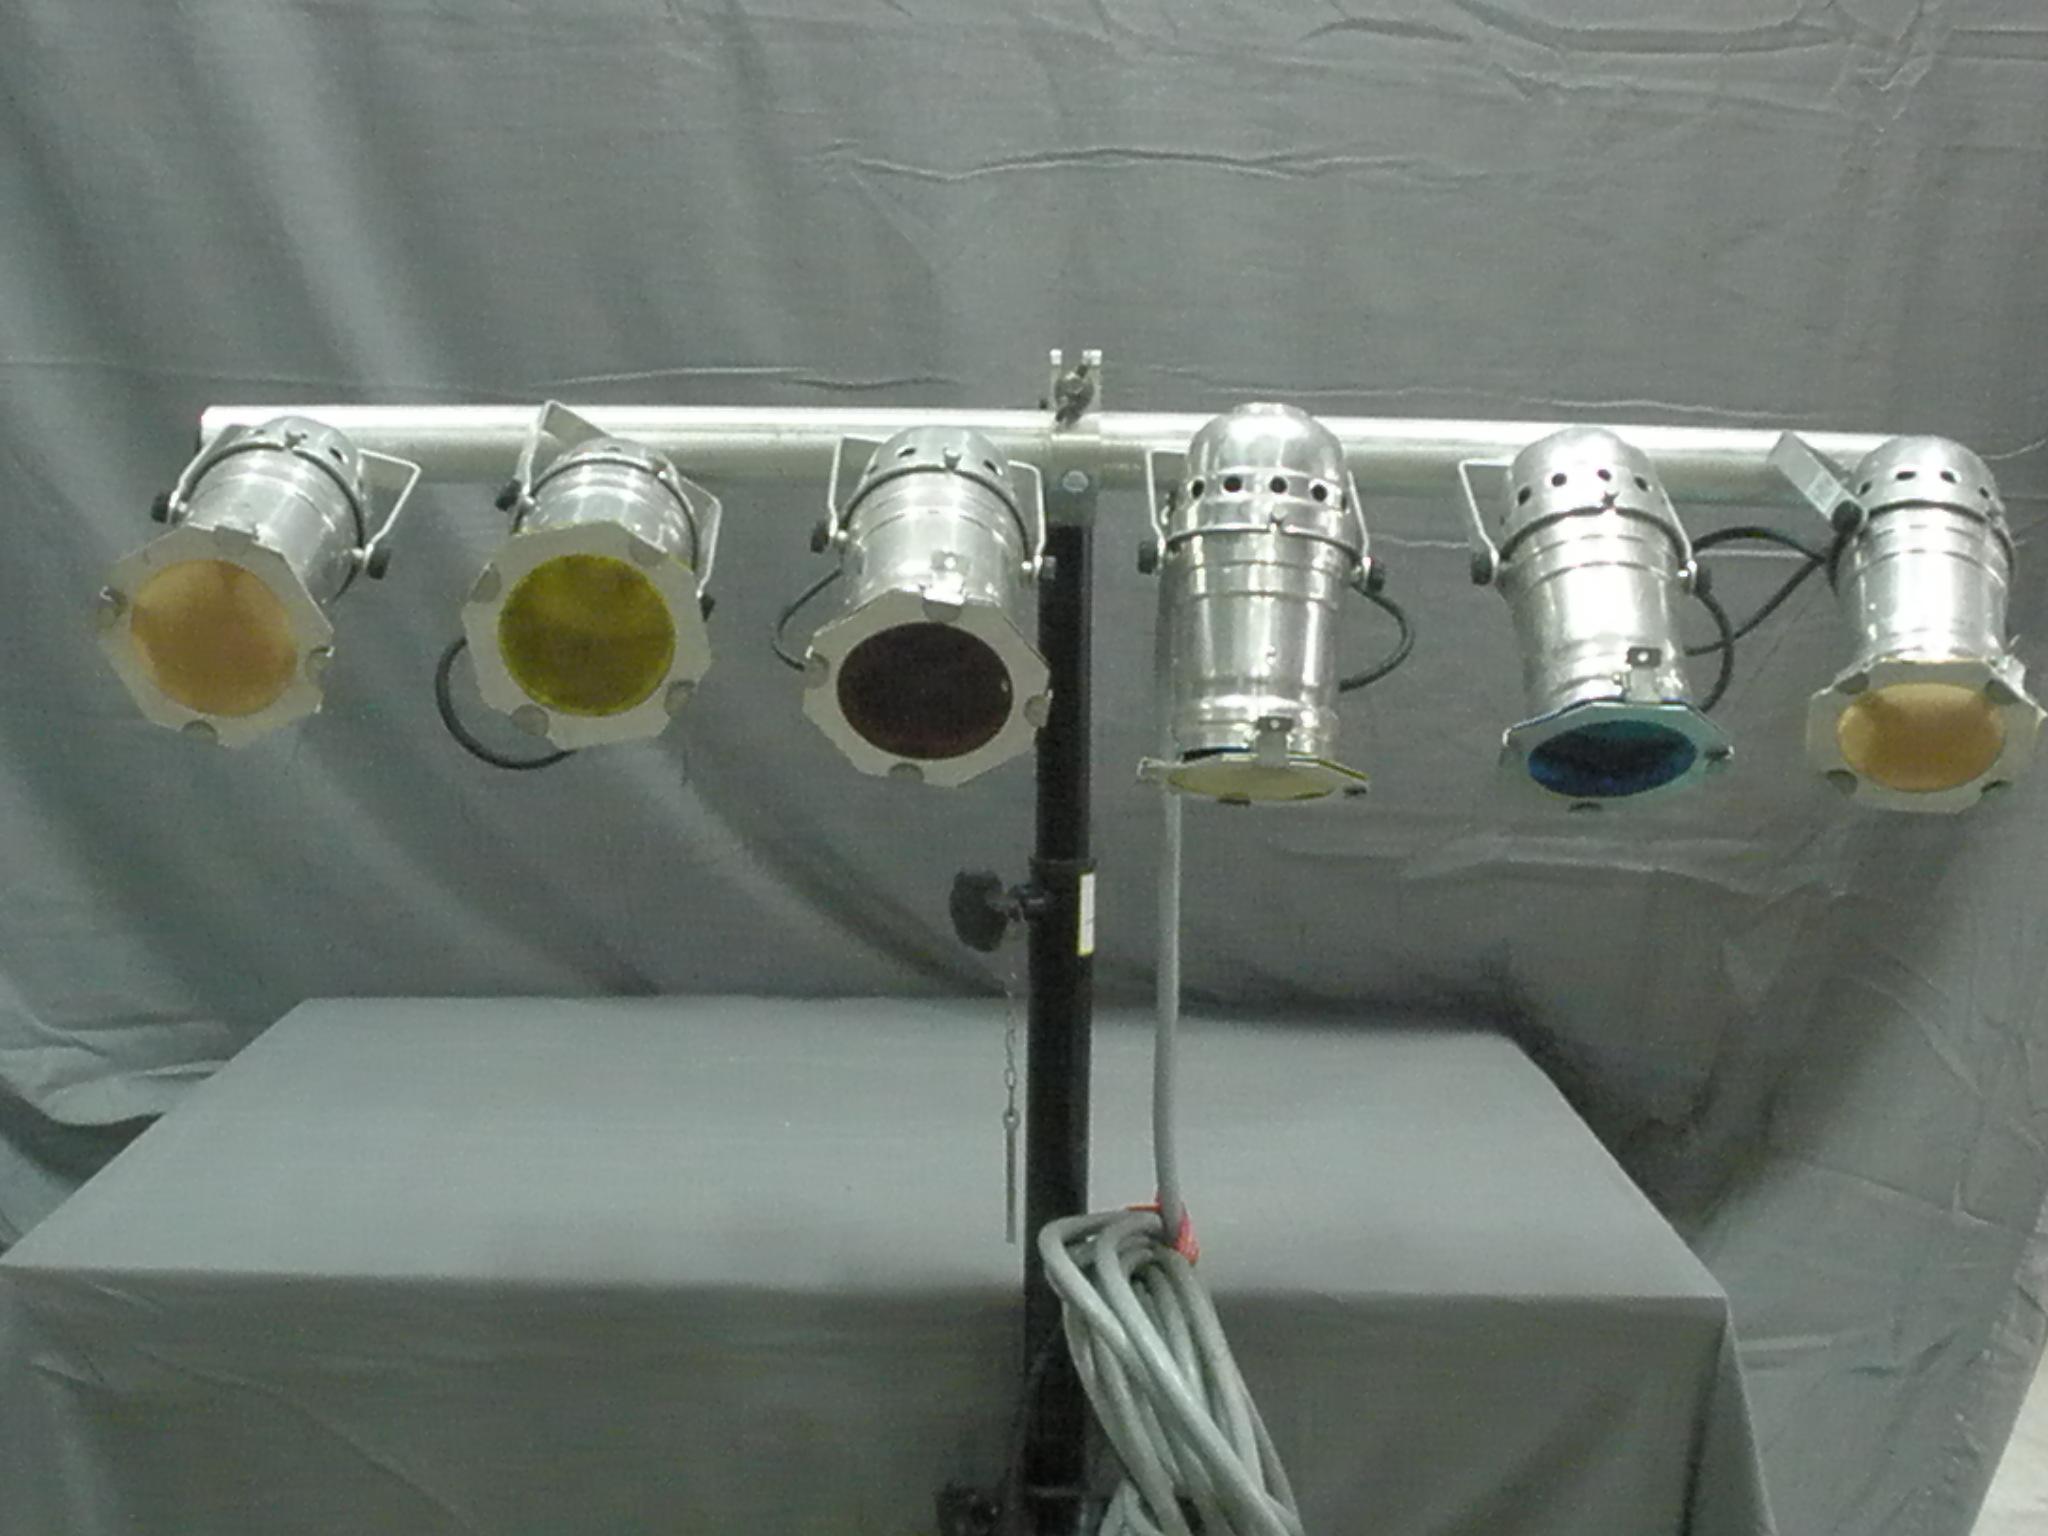 Circusevents Koeln lighting system PAR 36